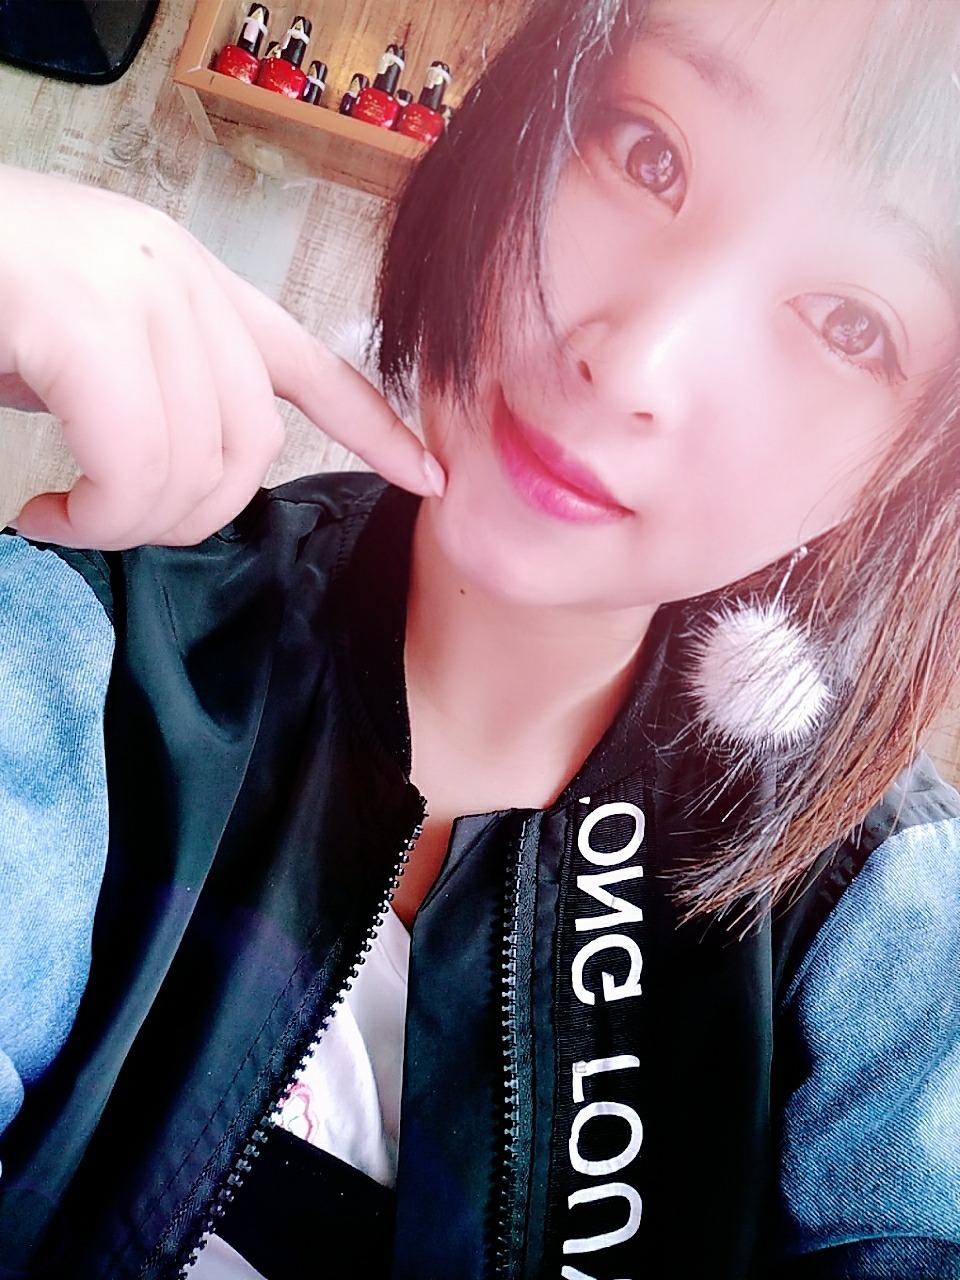 SelfieCity_20180521133743_save_mr1526887870966.jpg